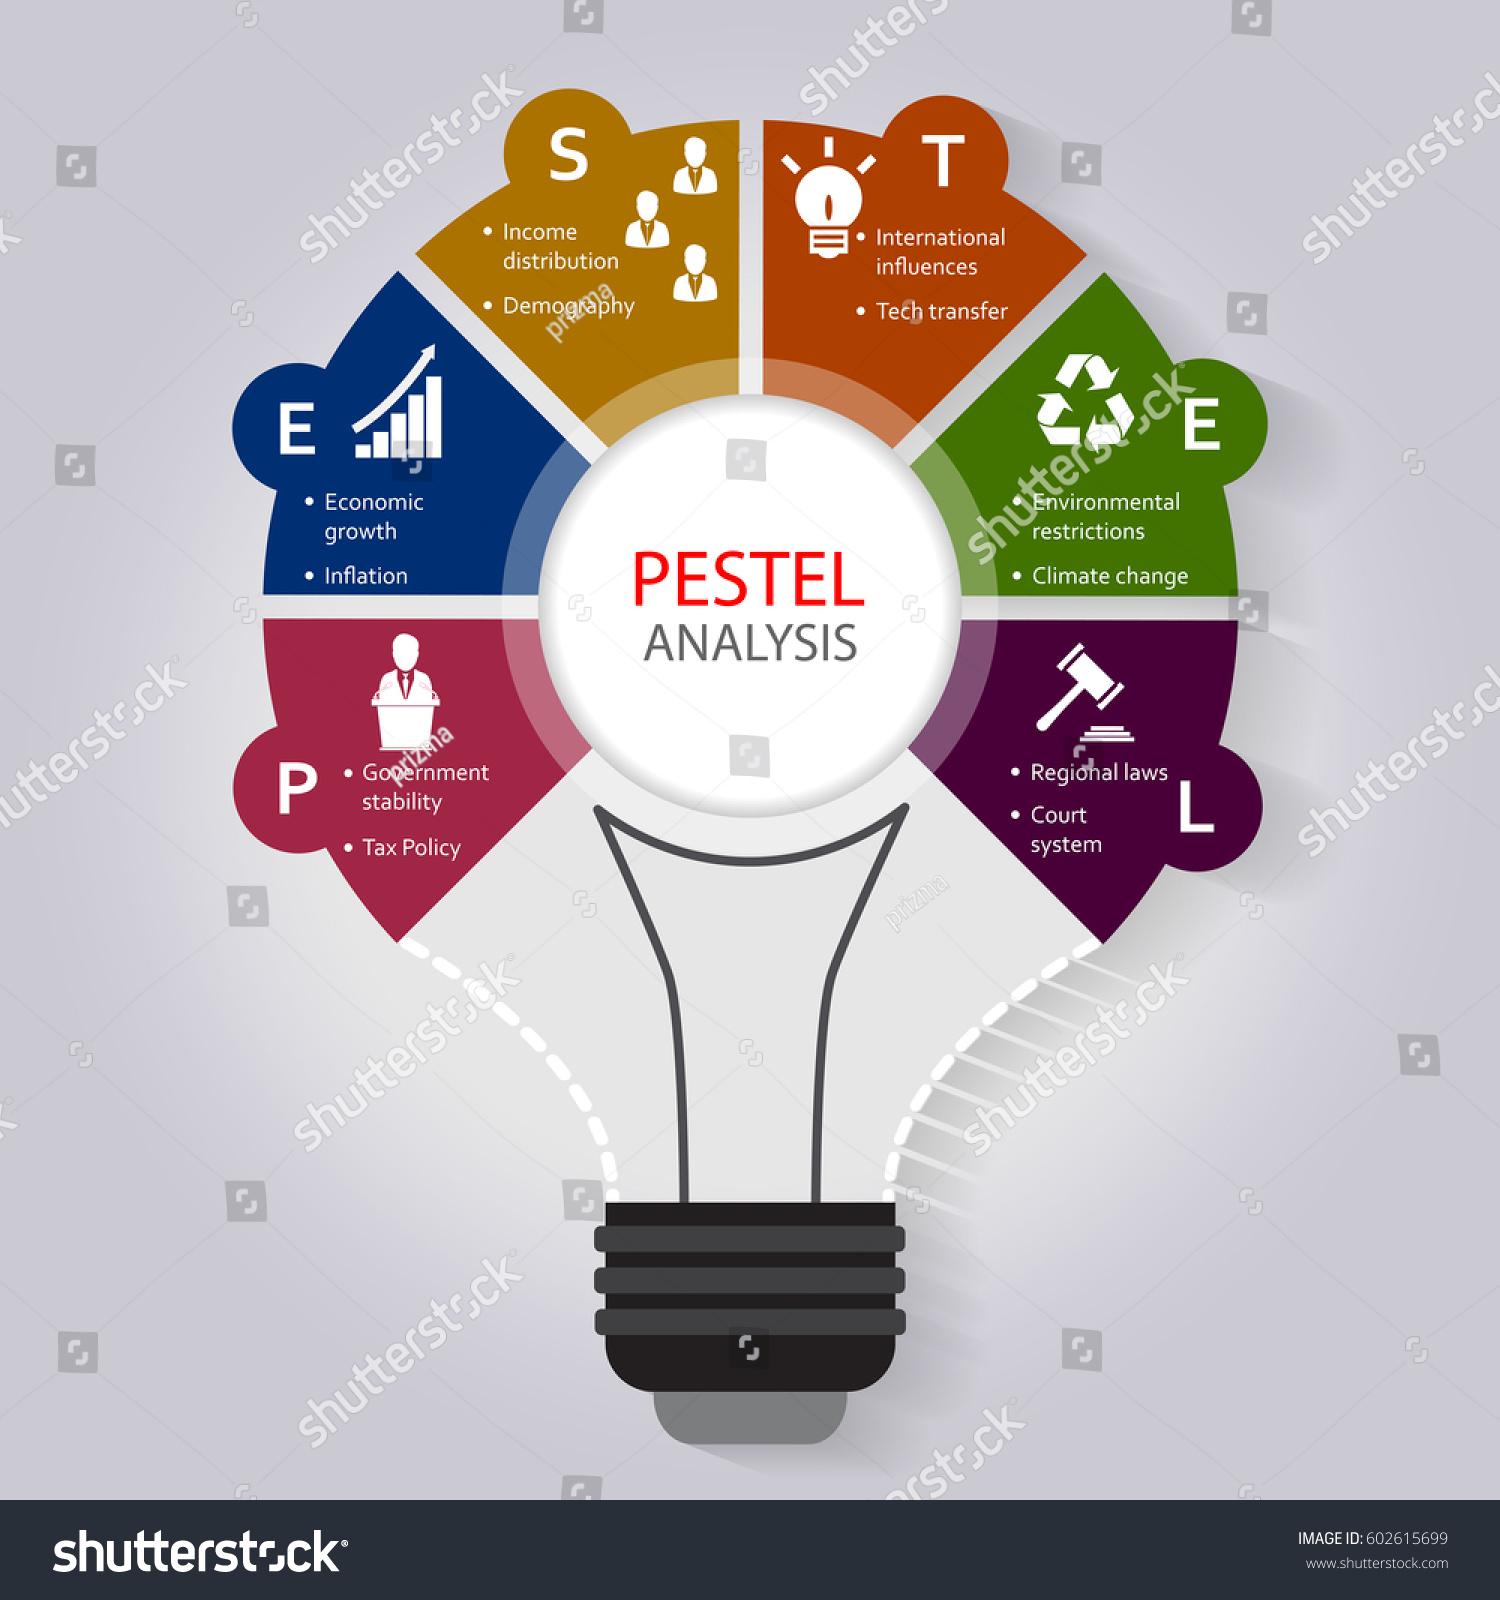 political environment analysis Mcdonald's pestel/pestle analysis & case study on political, economic, social, technological, ecological & legal external factors in the remote environment.